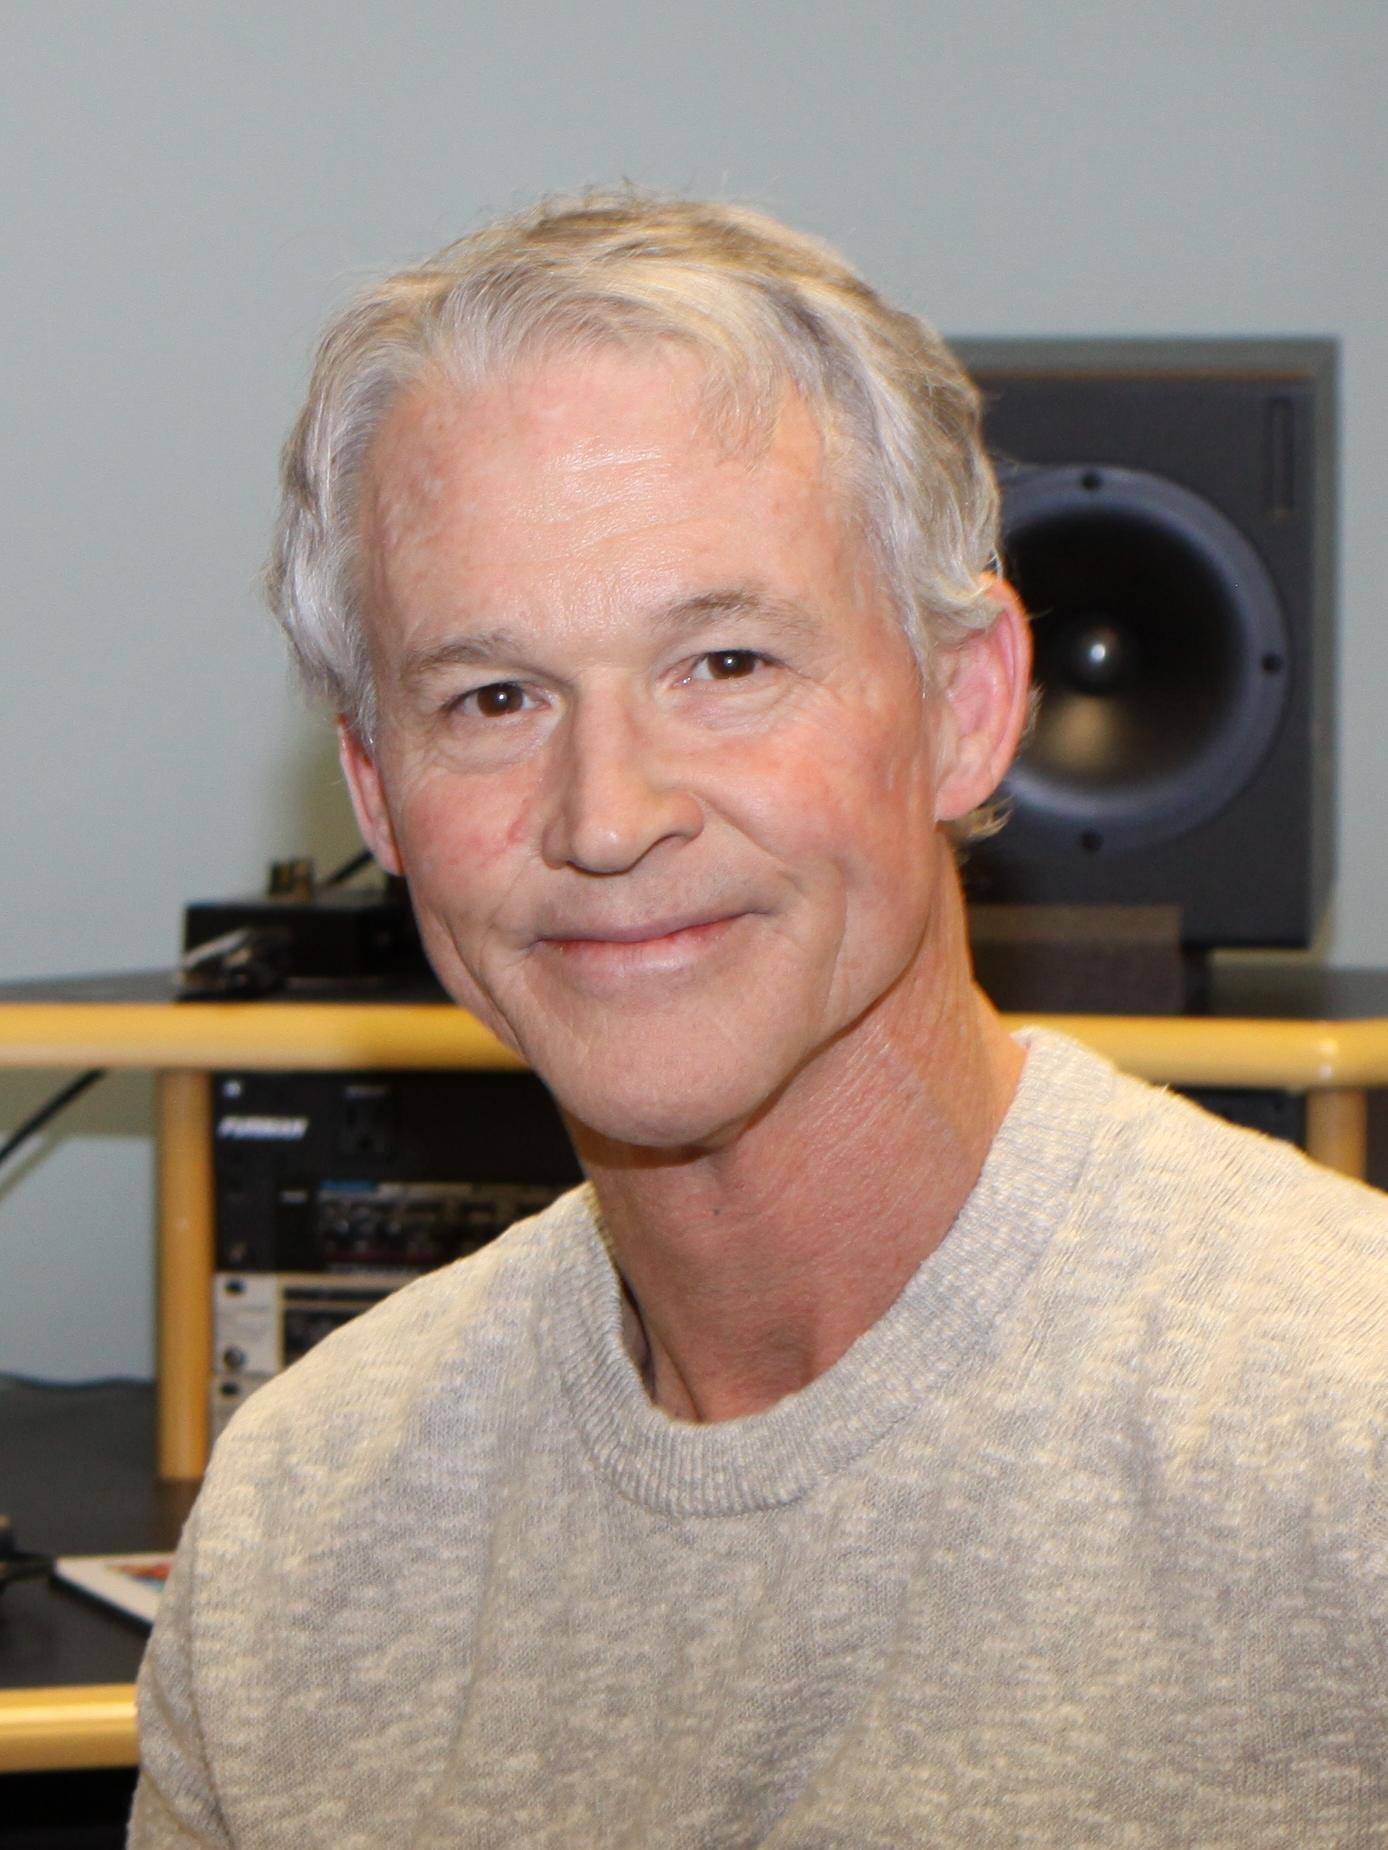 HPS Executive Director, Toby Ray Loyd